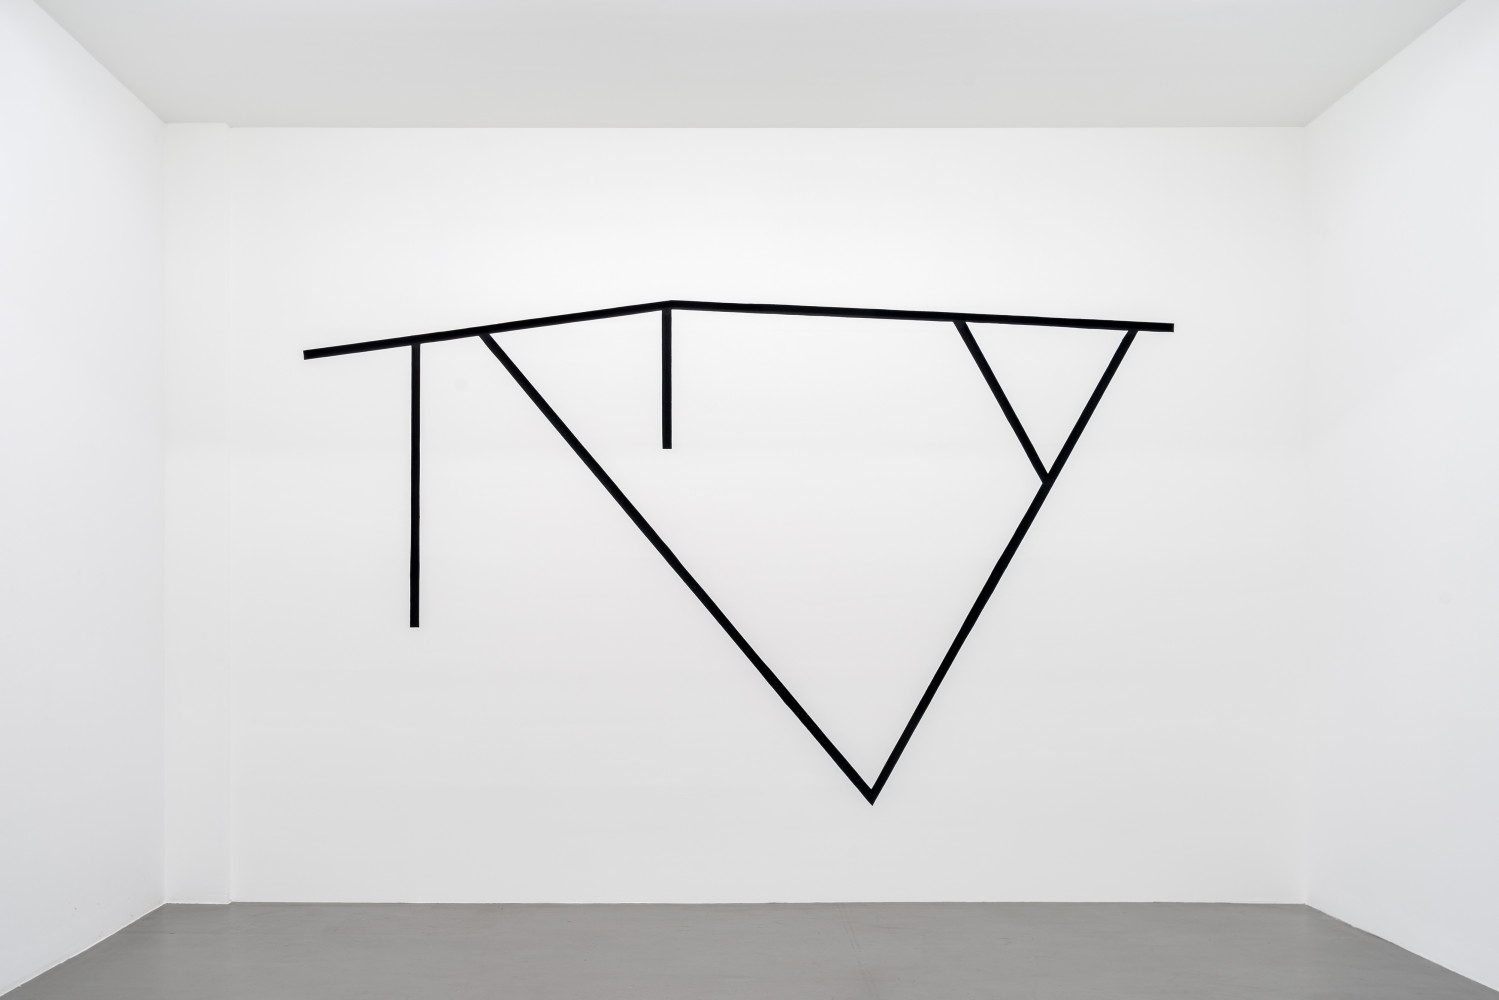 William Tucker, 'Porte VI, 2020 (1973)'